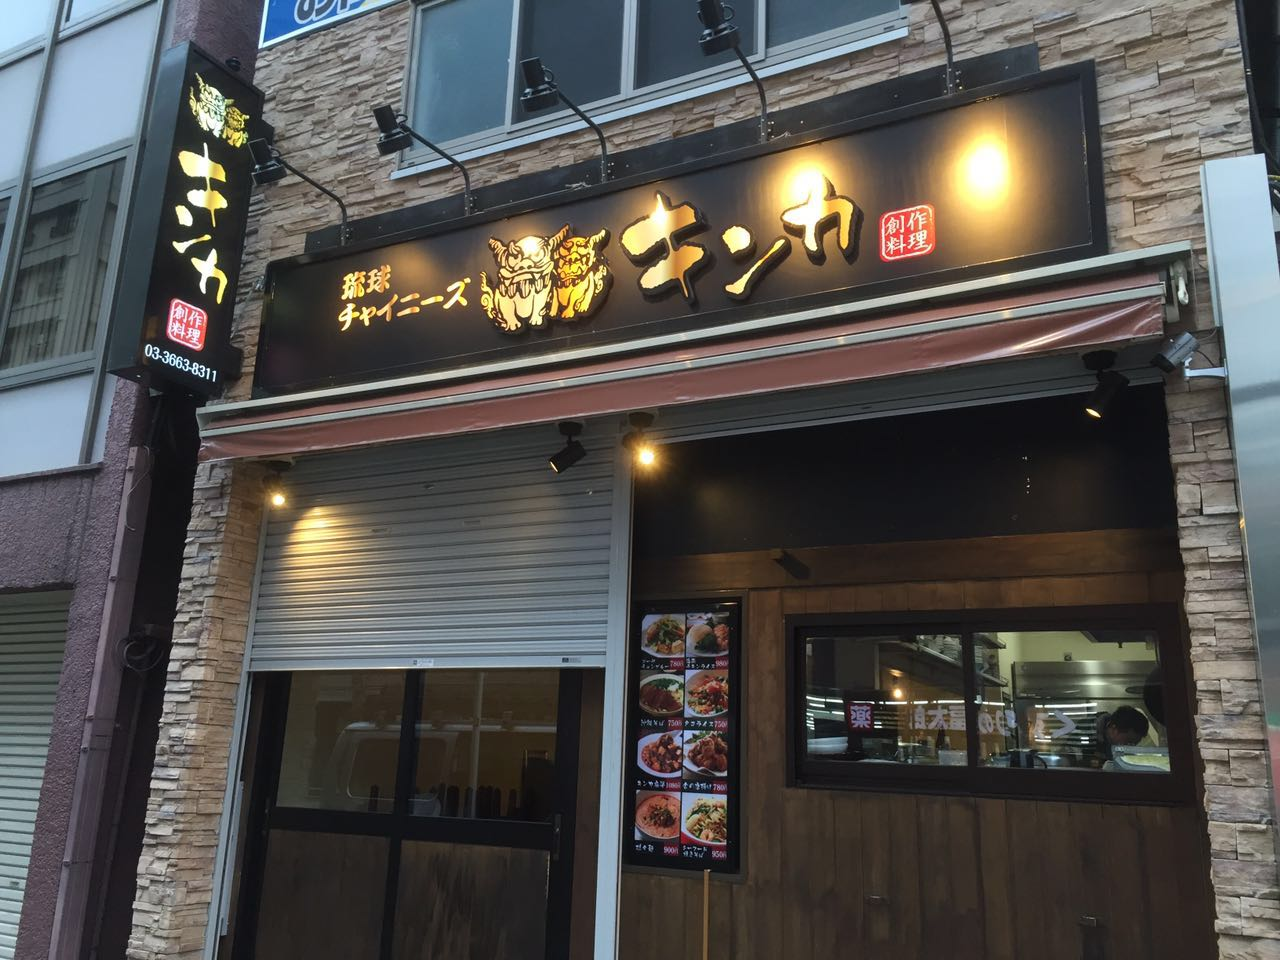 沖縄料理屋看板,カルプ文字看板